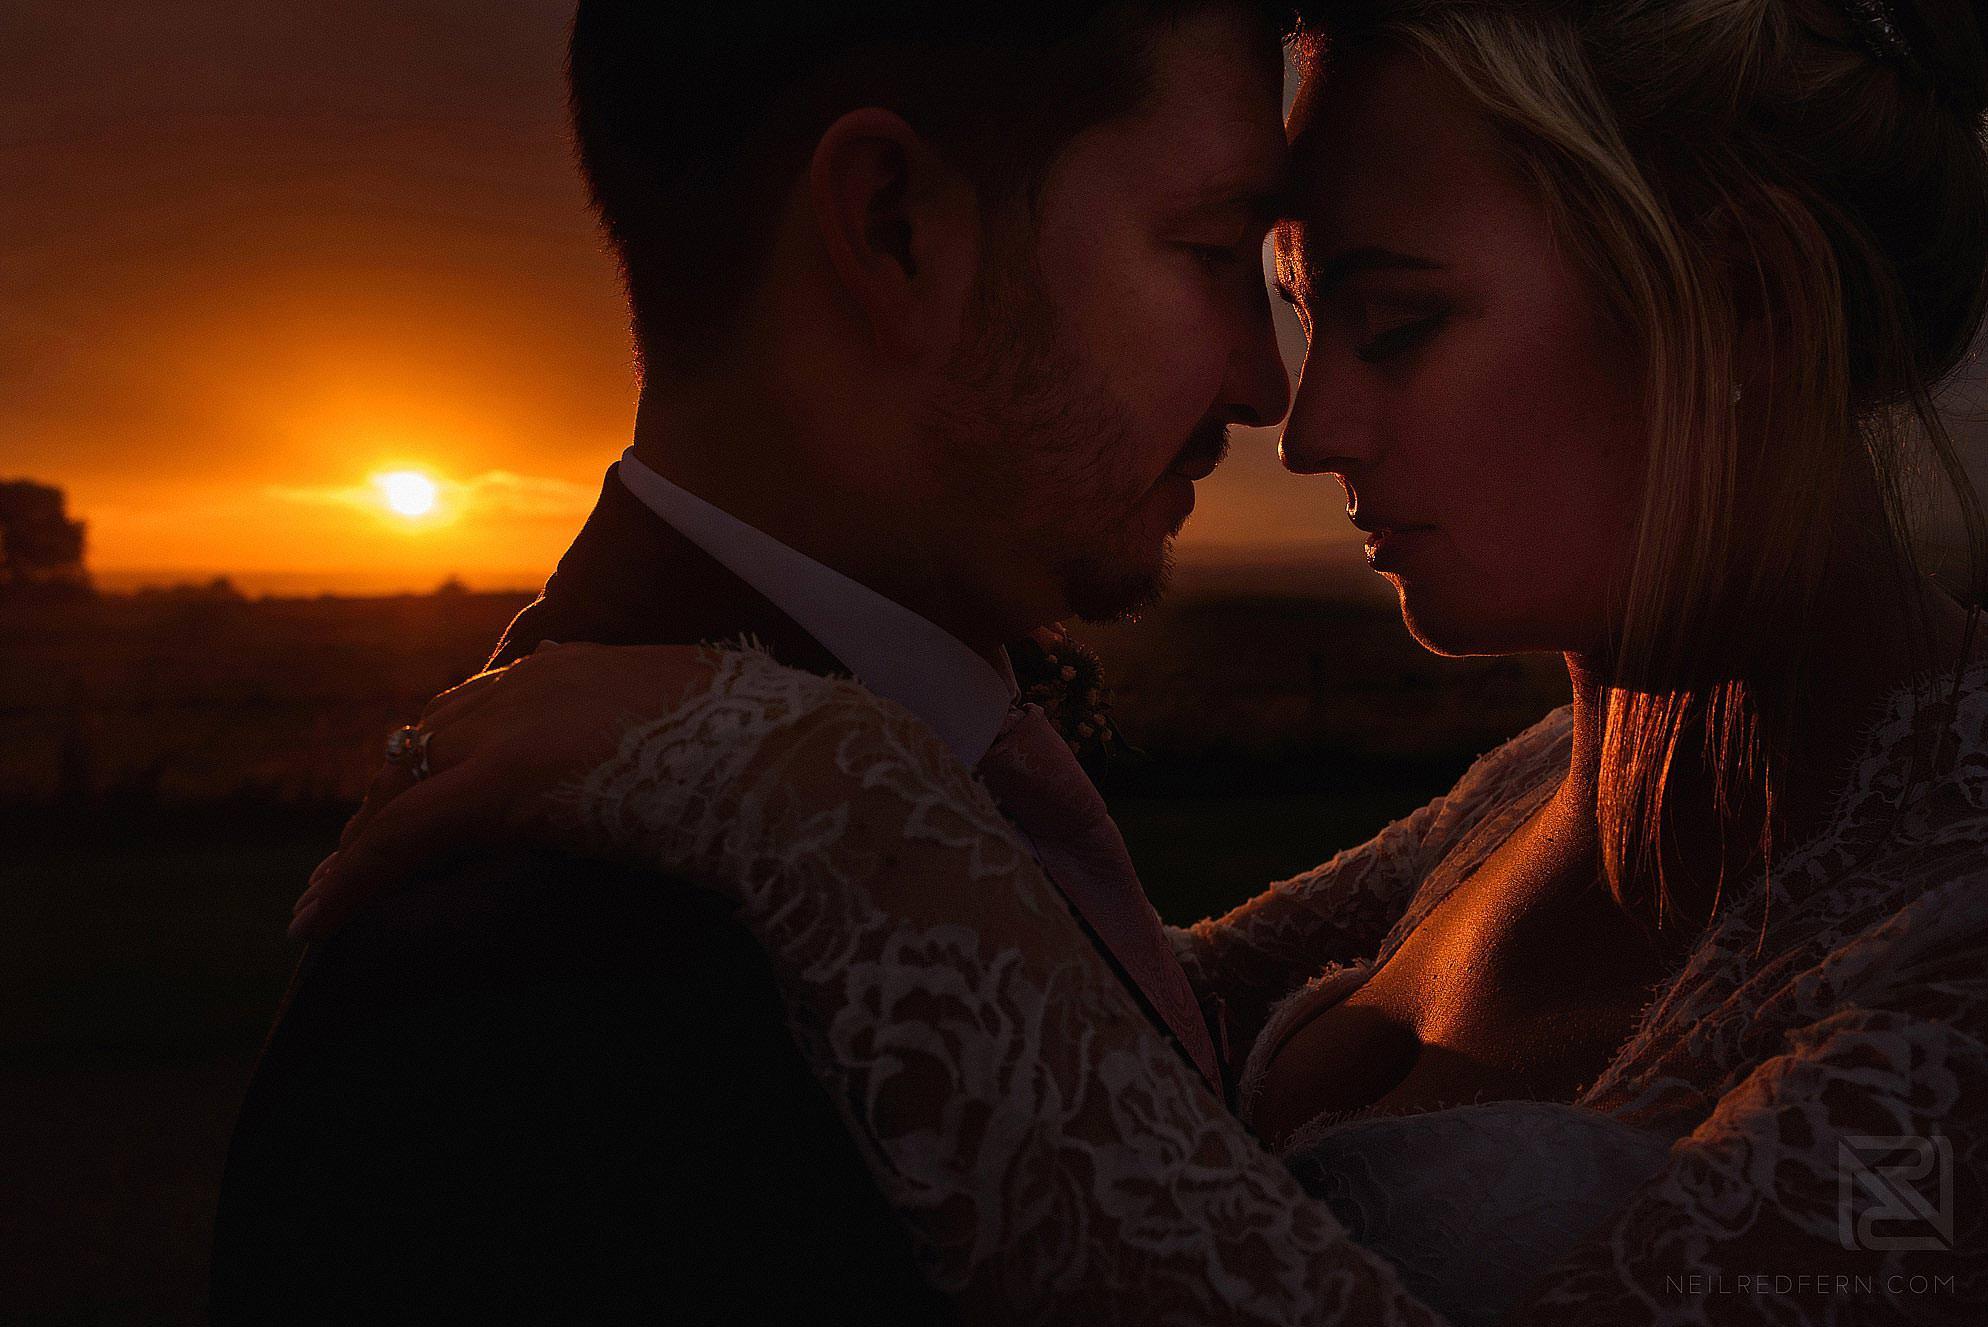 best-wedding-photography-2016-024